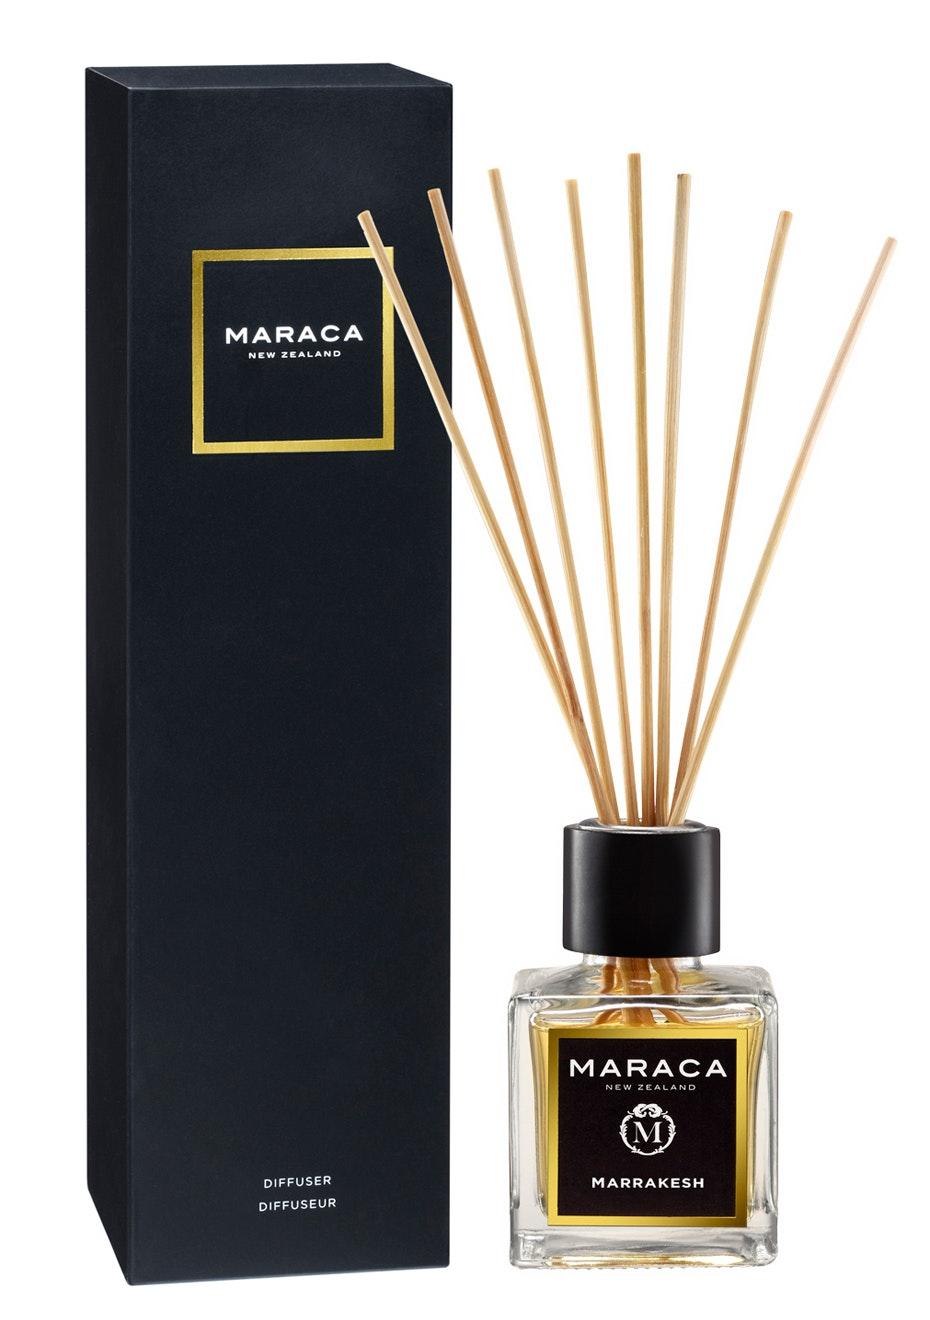 Maraca - Marrakesh Room Diffuser 100ml